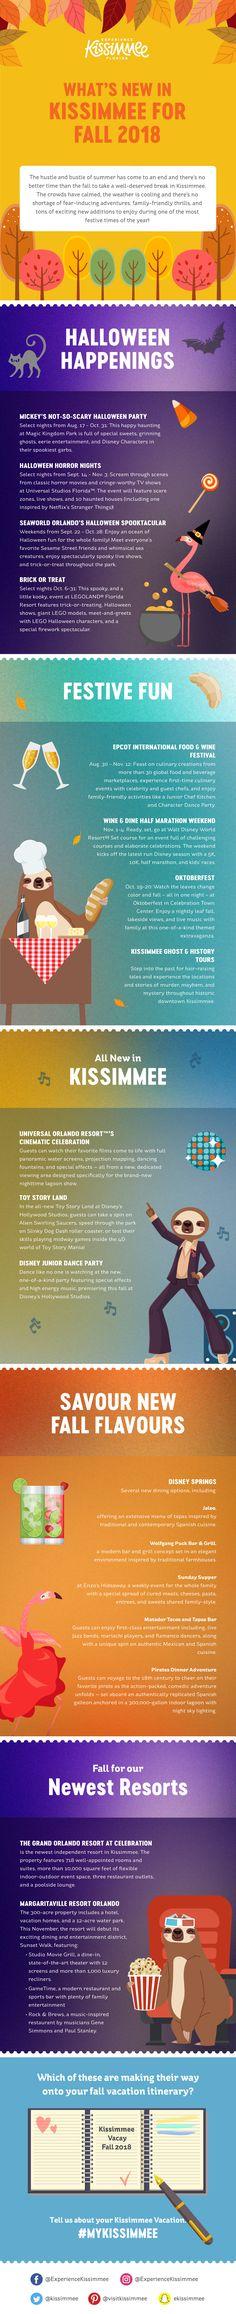 Haken in Kissimmee Metallkopf Datierung frei